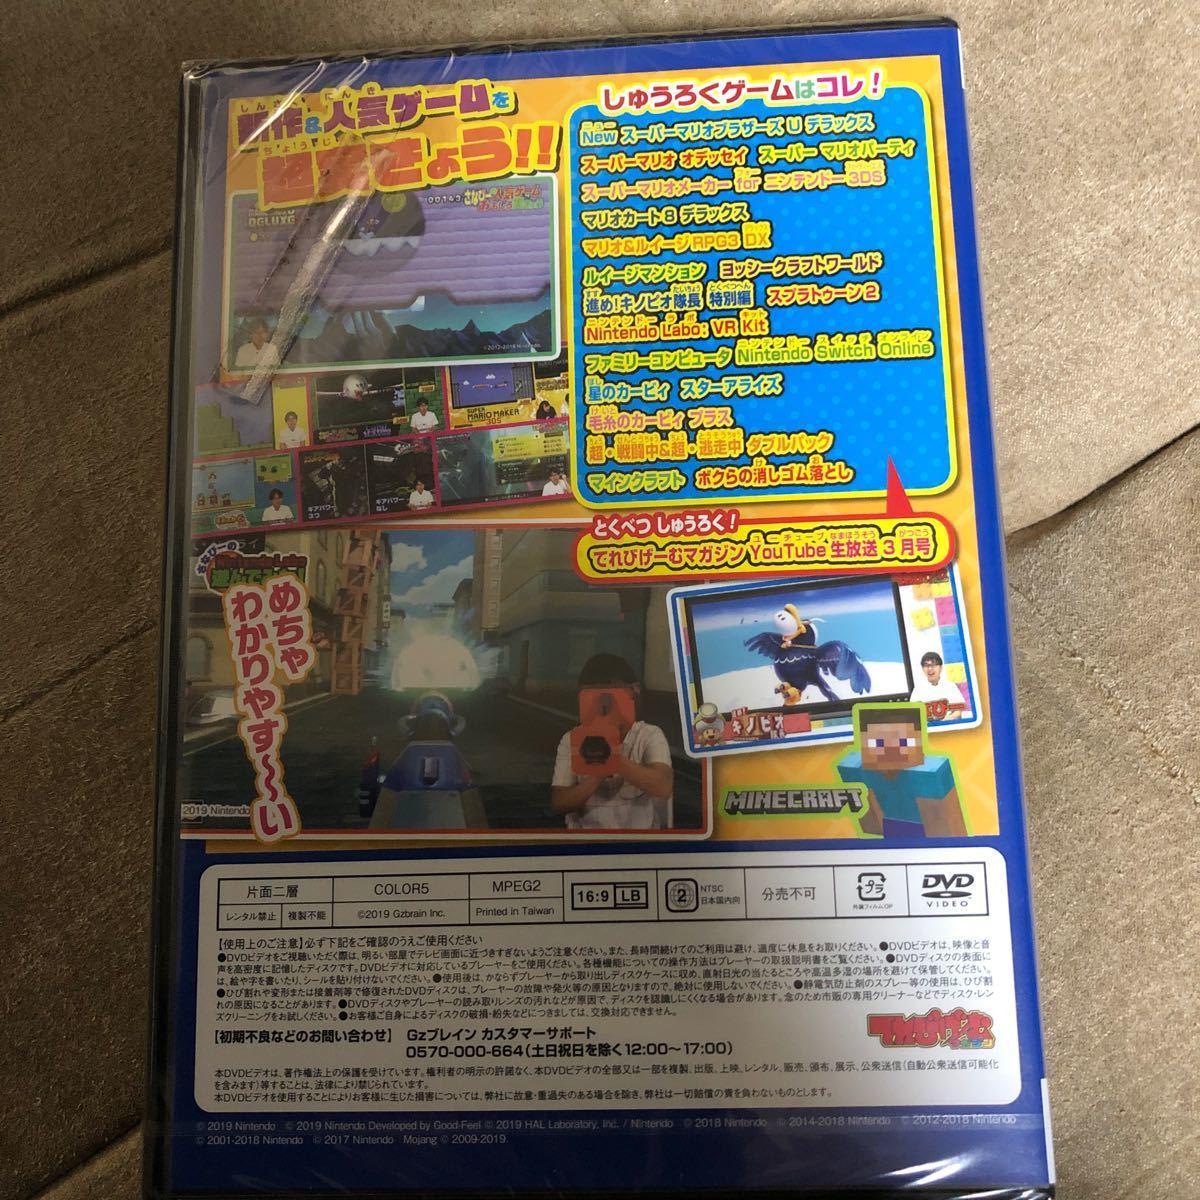 DVD 大興奮!!ゲーム実きょうDVDスペシャルスーパーマリオメーカー